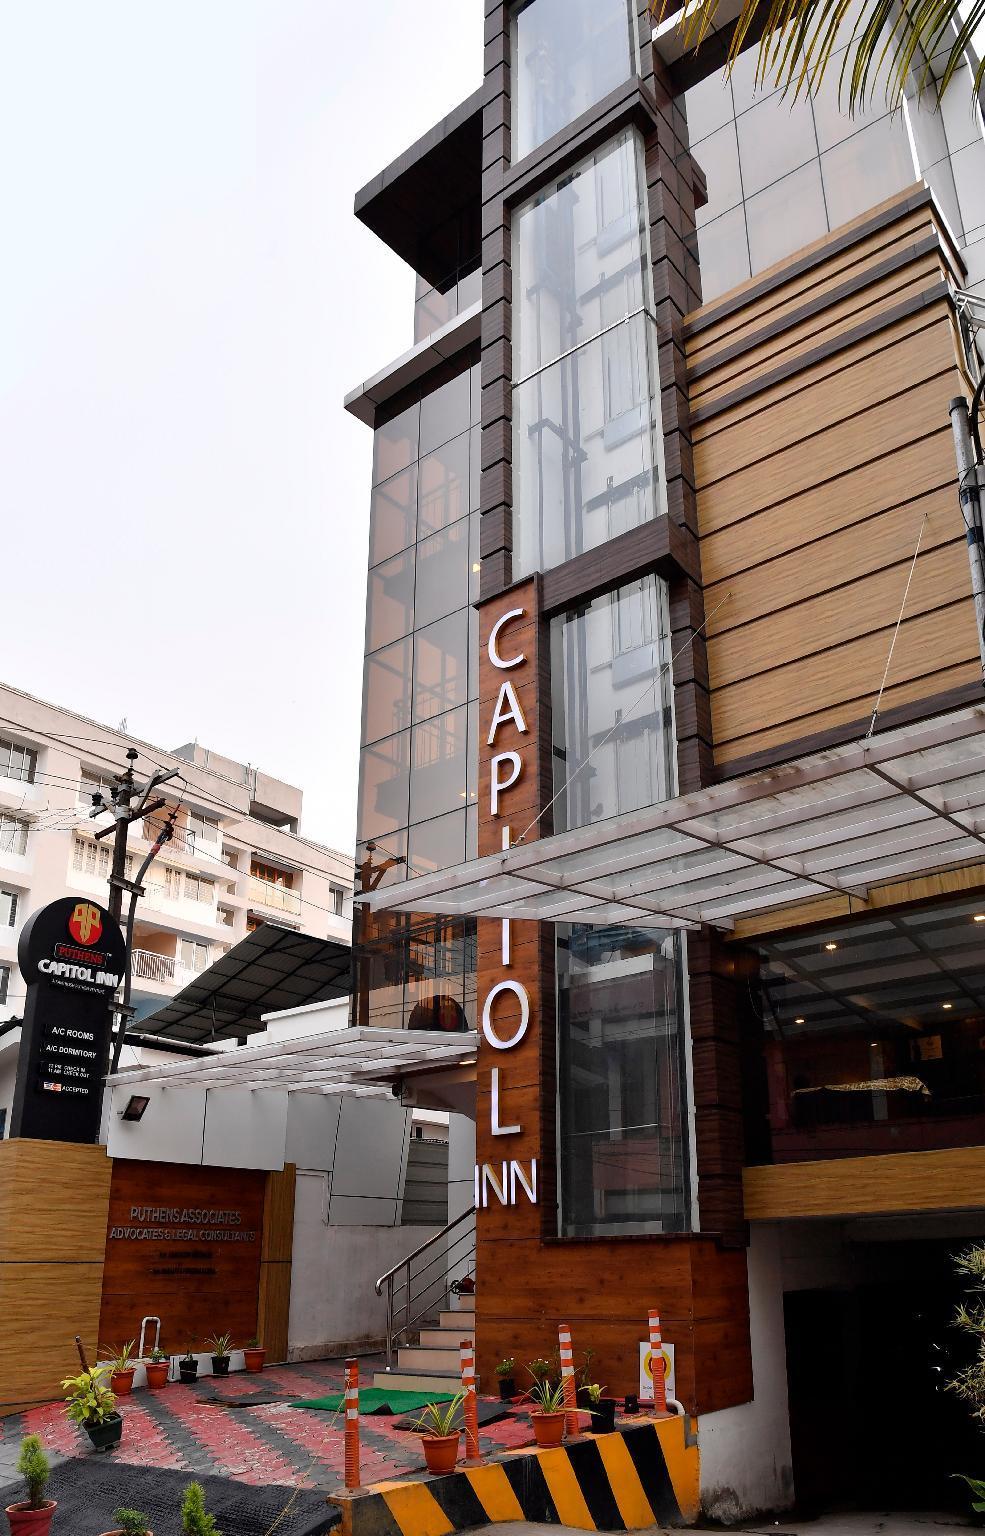 Puthens Capitol Inn